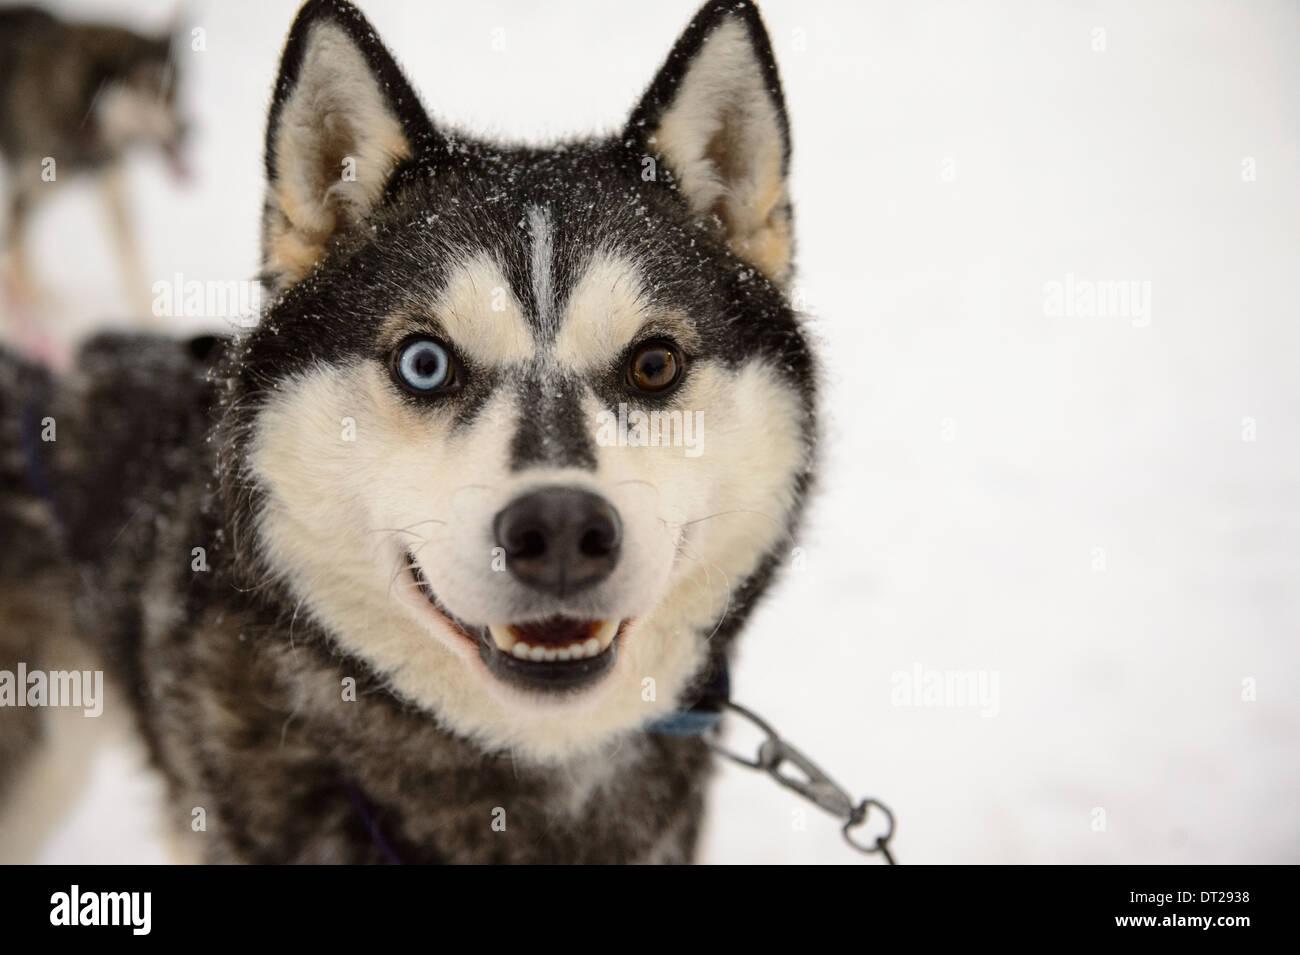 Husky smiling - Stock Image